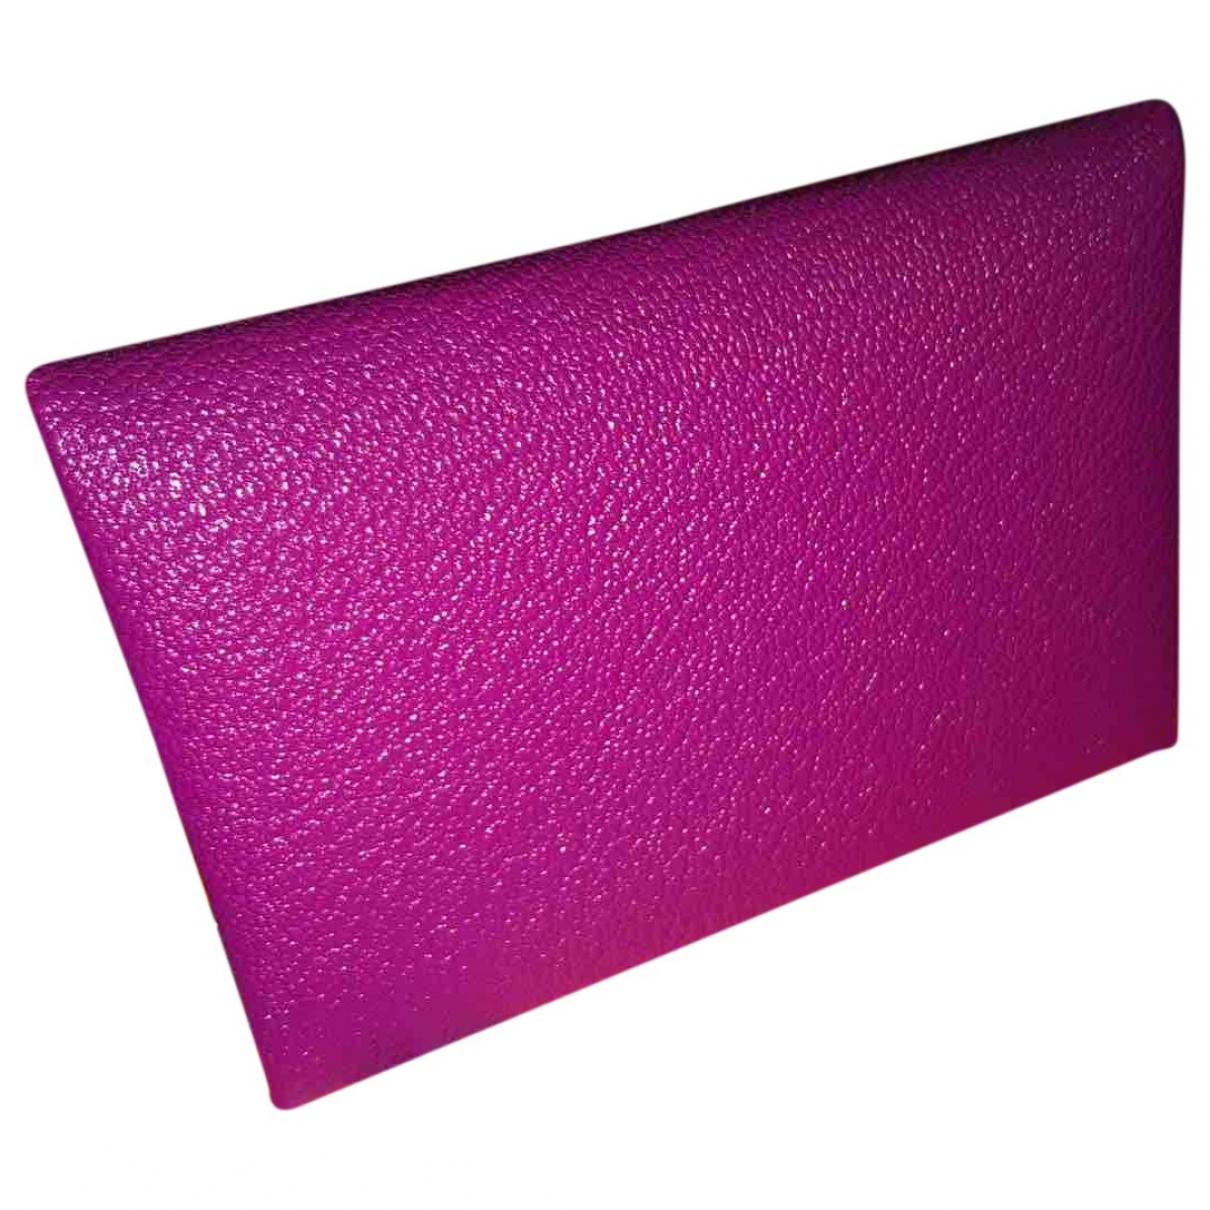 Hermes - Petite maroquinerie Calvi pour femme en cuir - rose